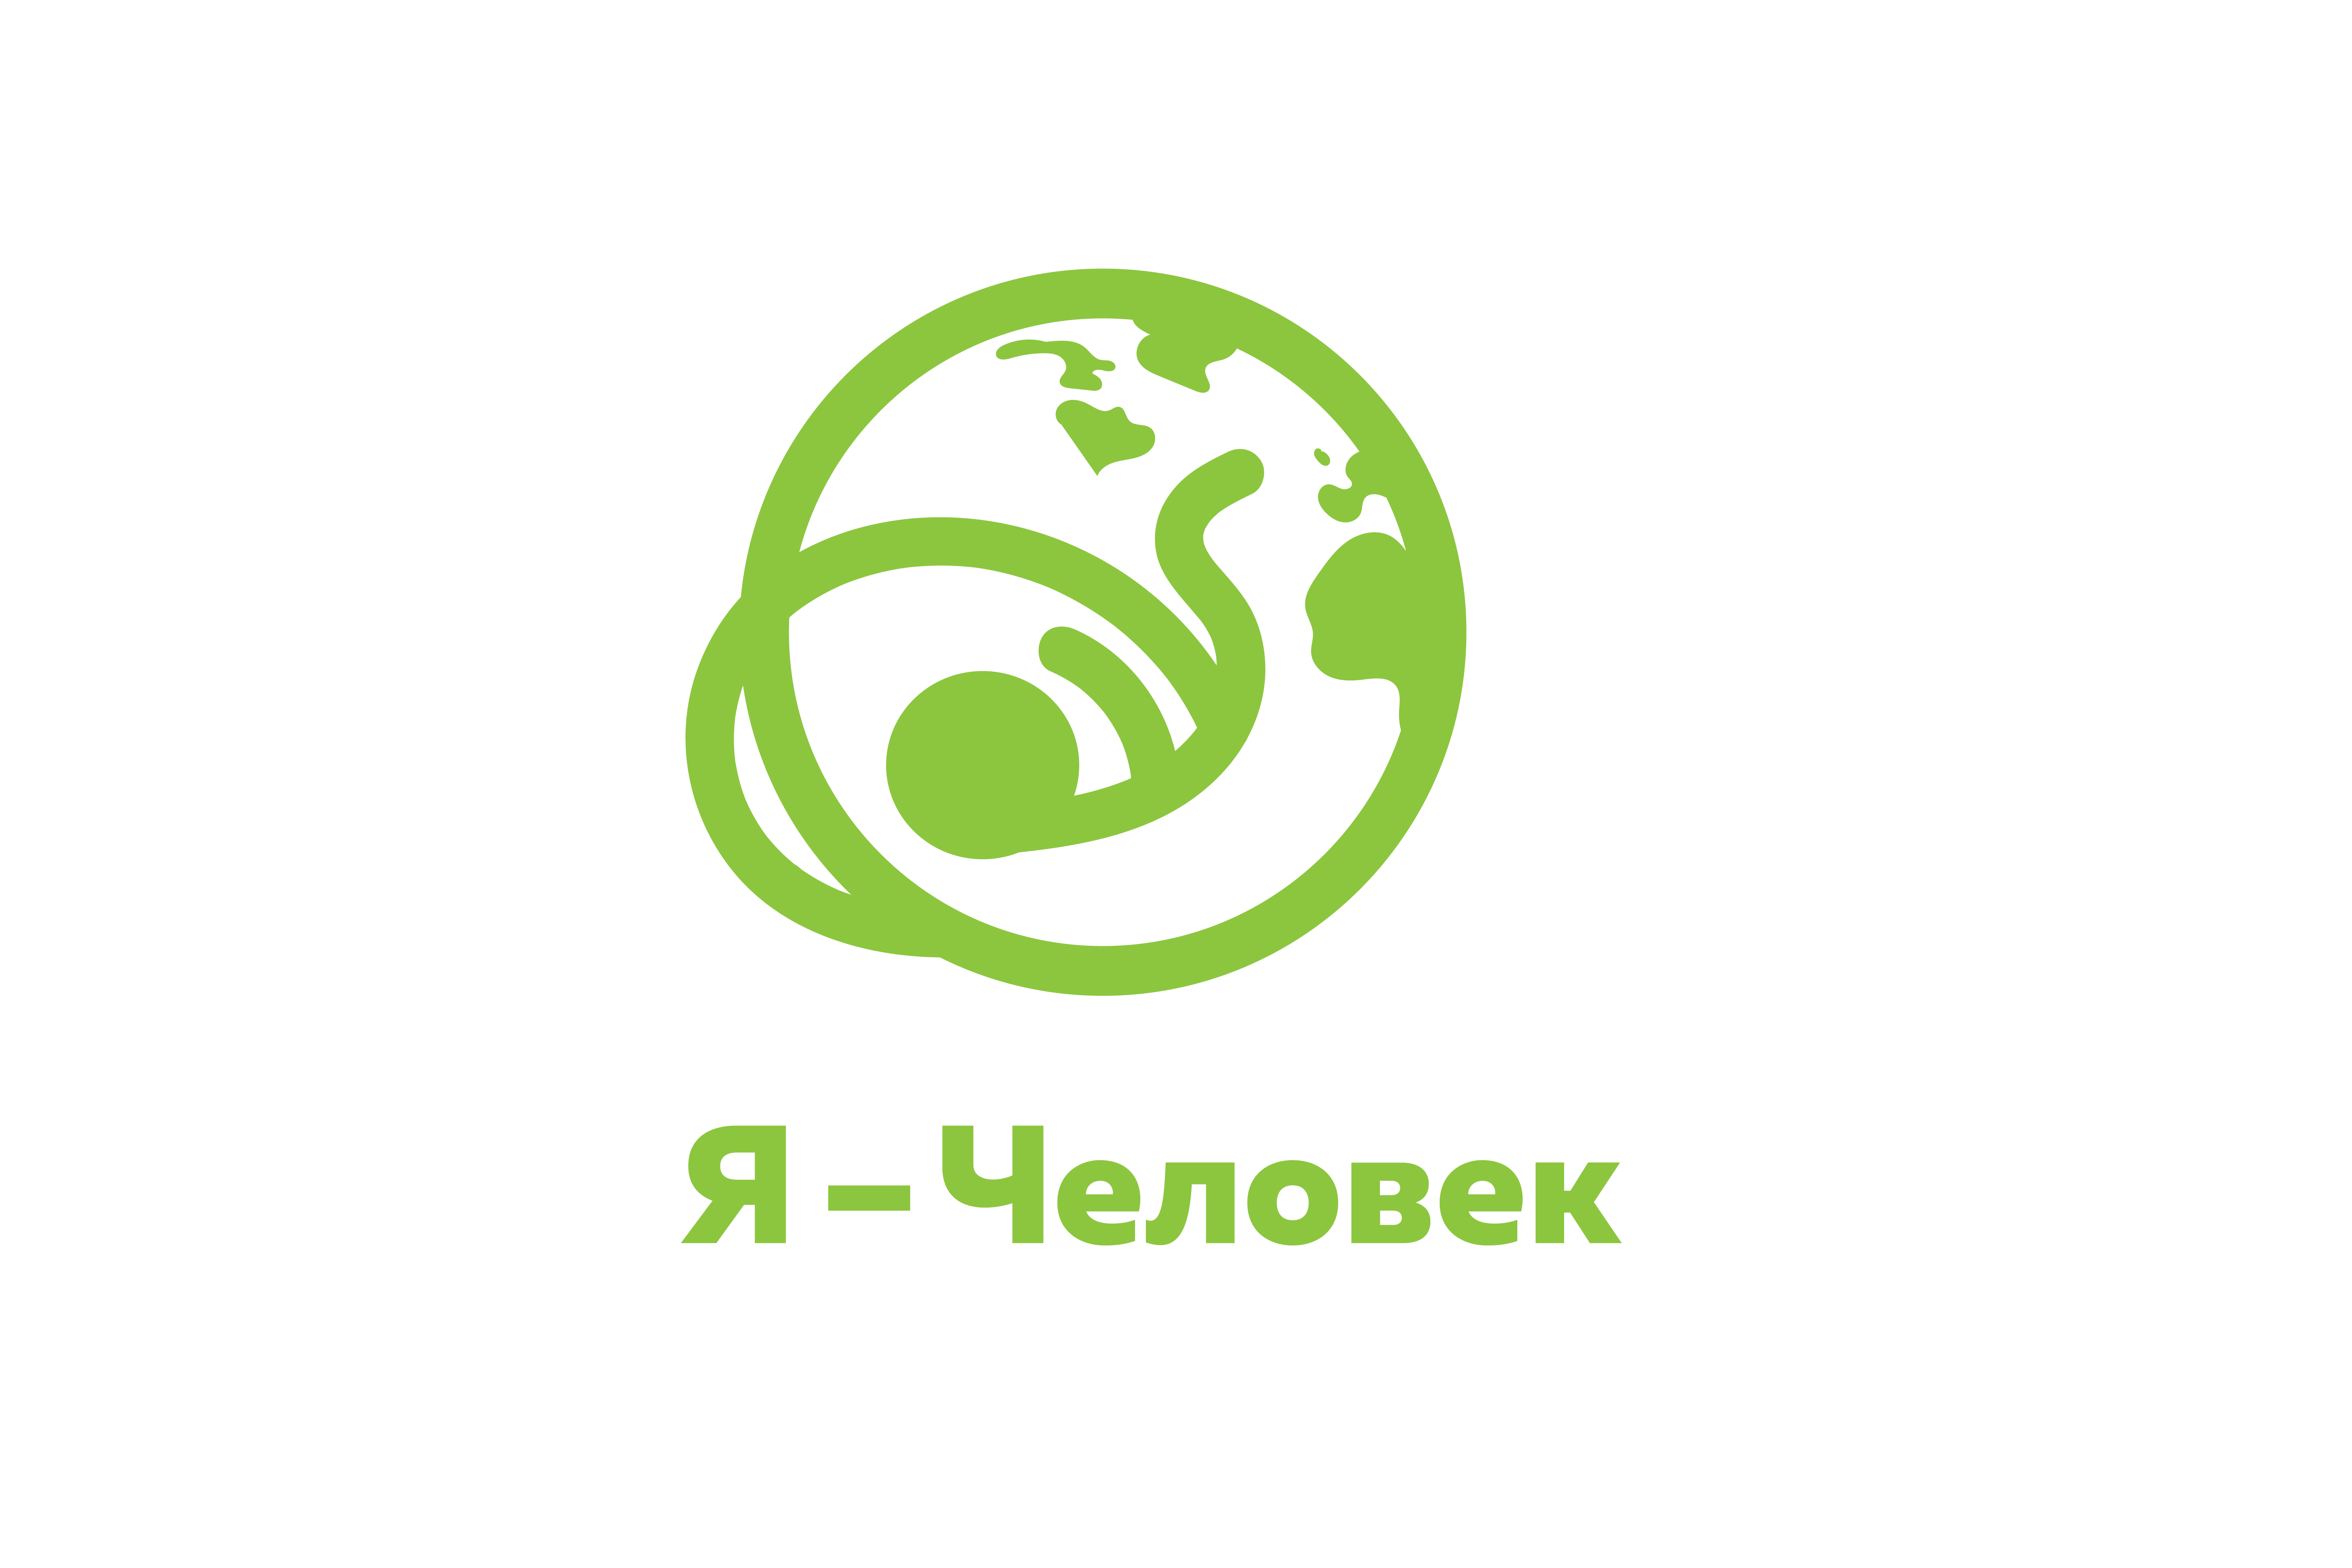 Конкурс на создание логотипа фото f_7205d25f326955ea.jpg